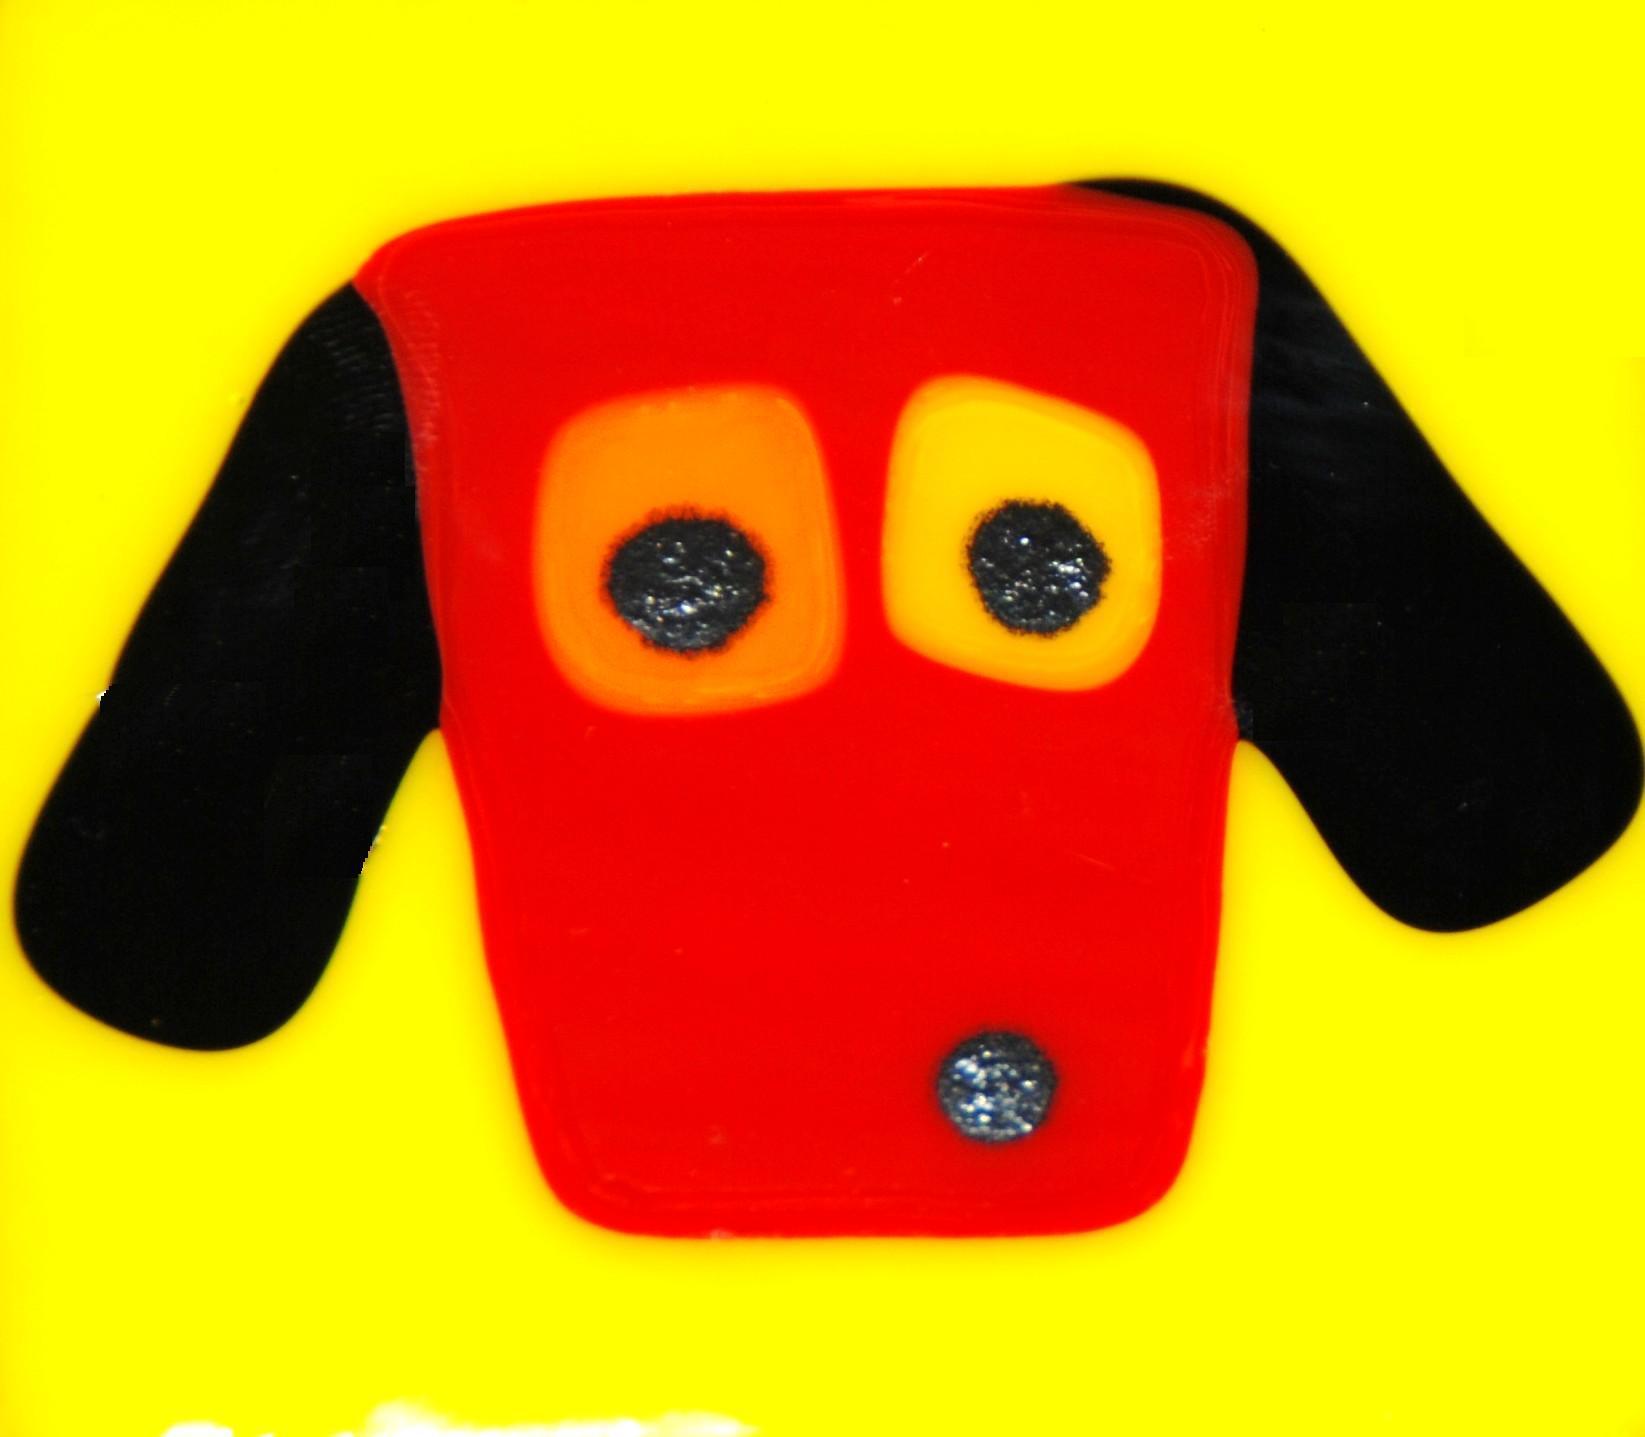 red dog on goldcopy.jpg